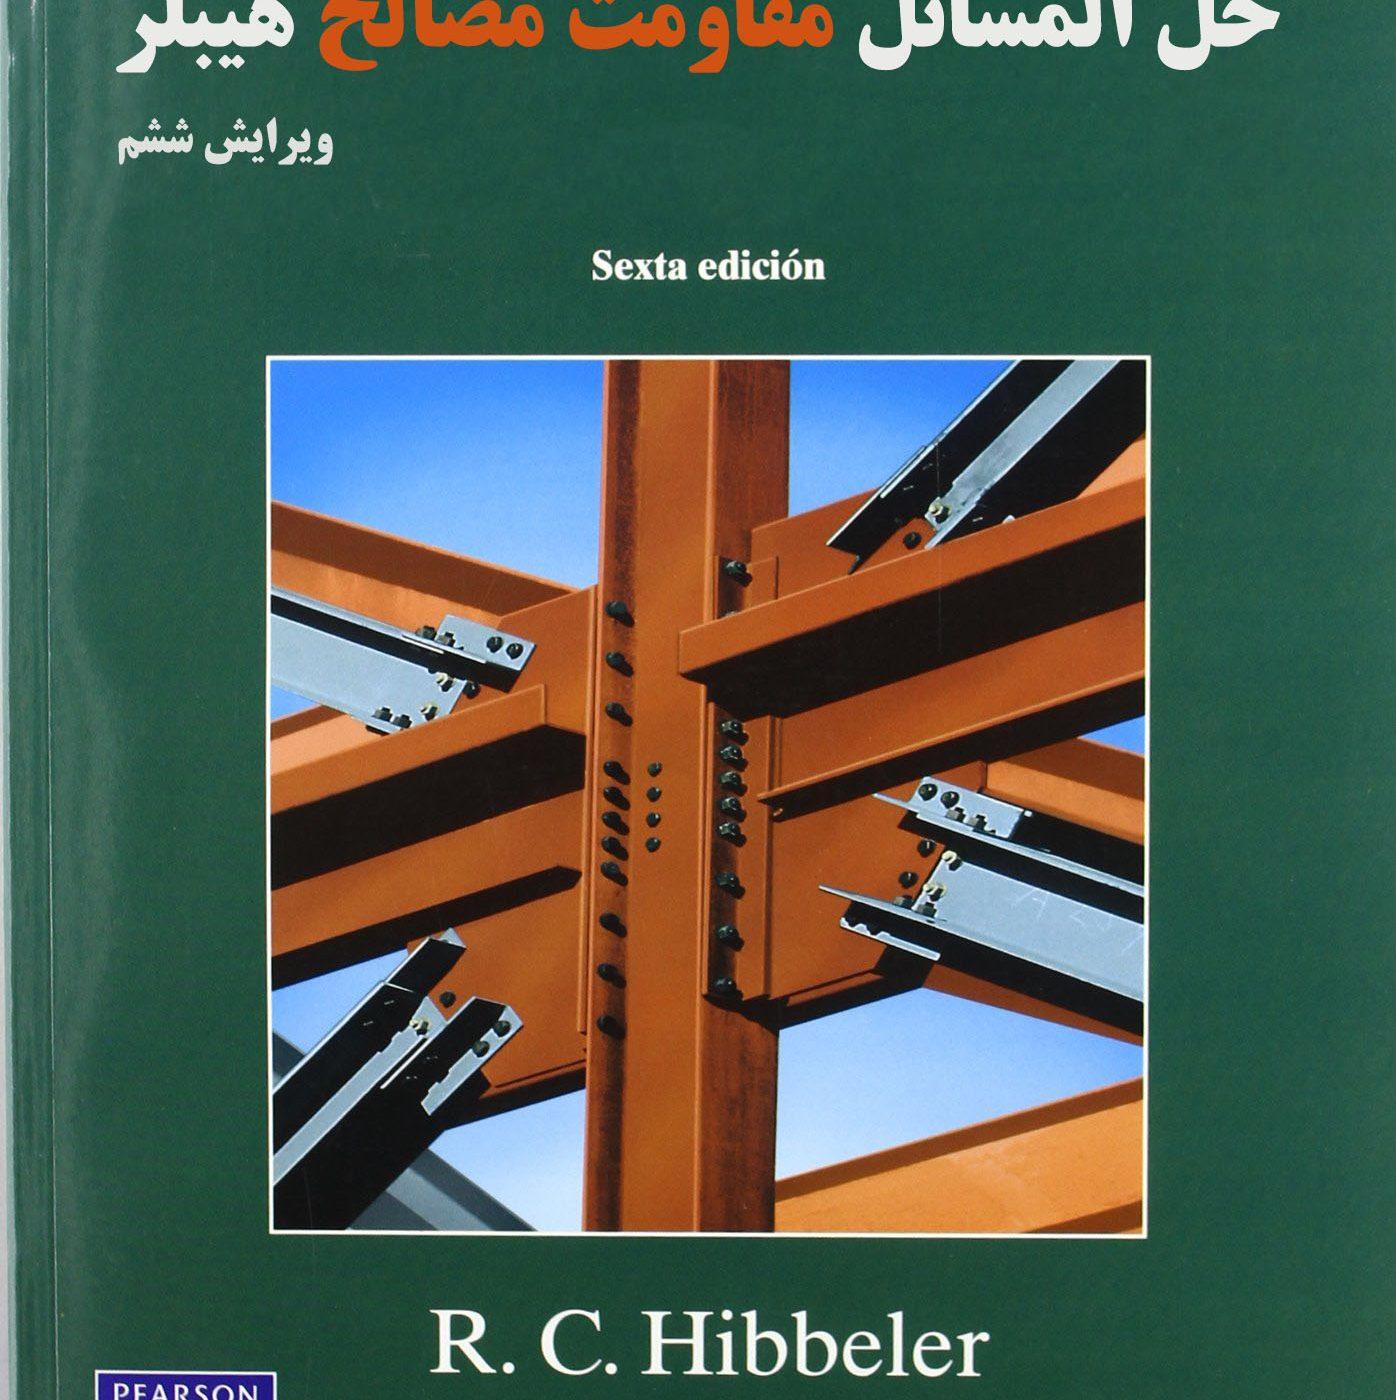 دانلود حل المسائل مقاومت مصالح هیبلر ویرایش 6